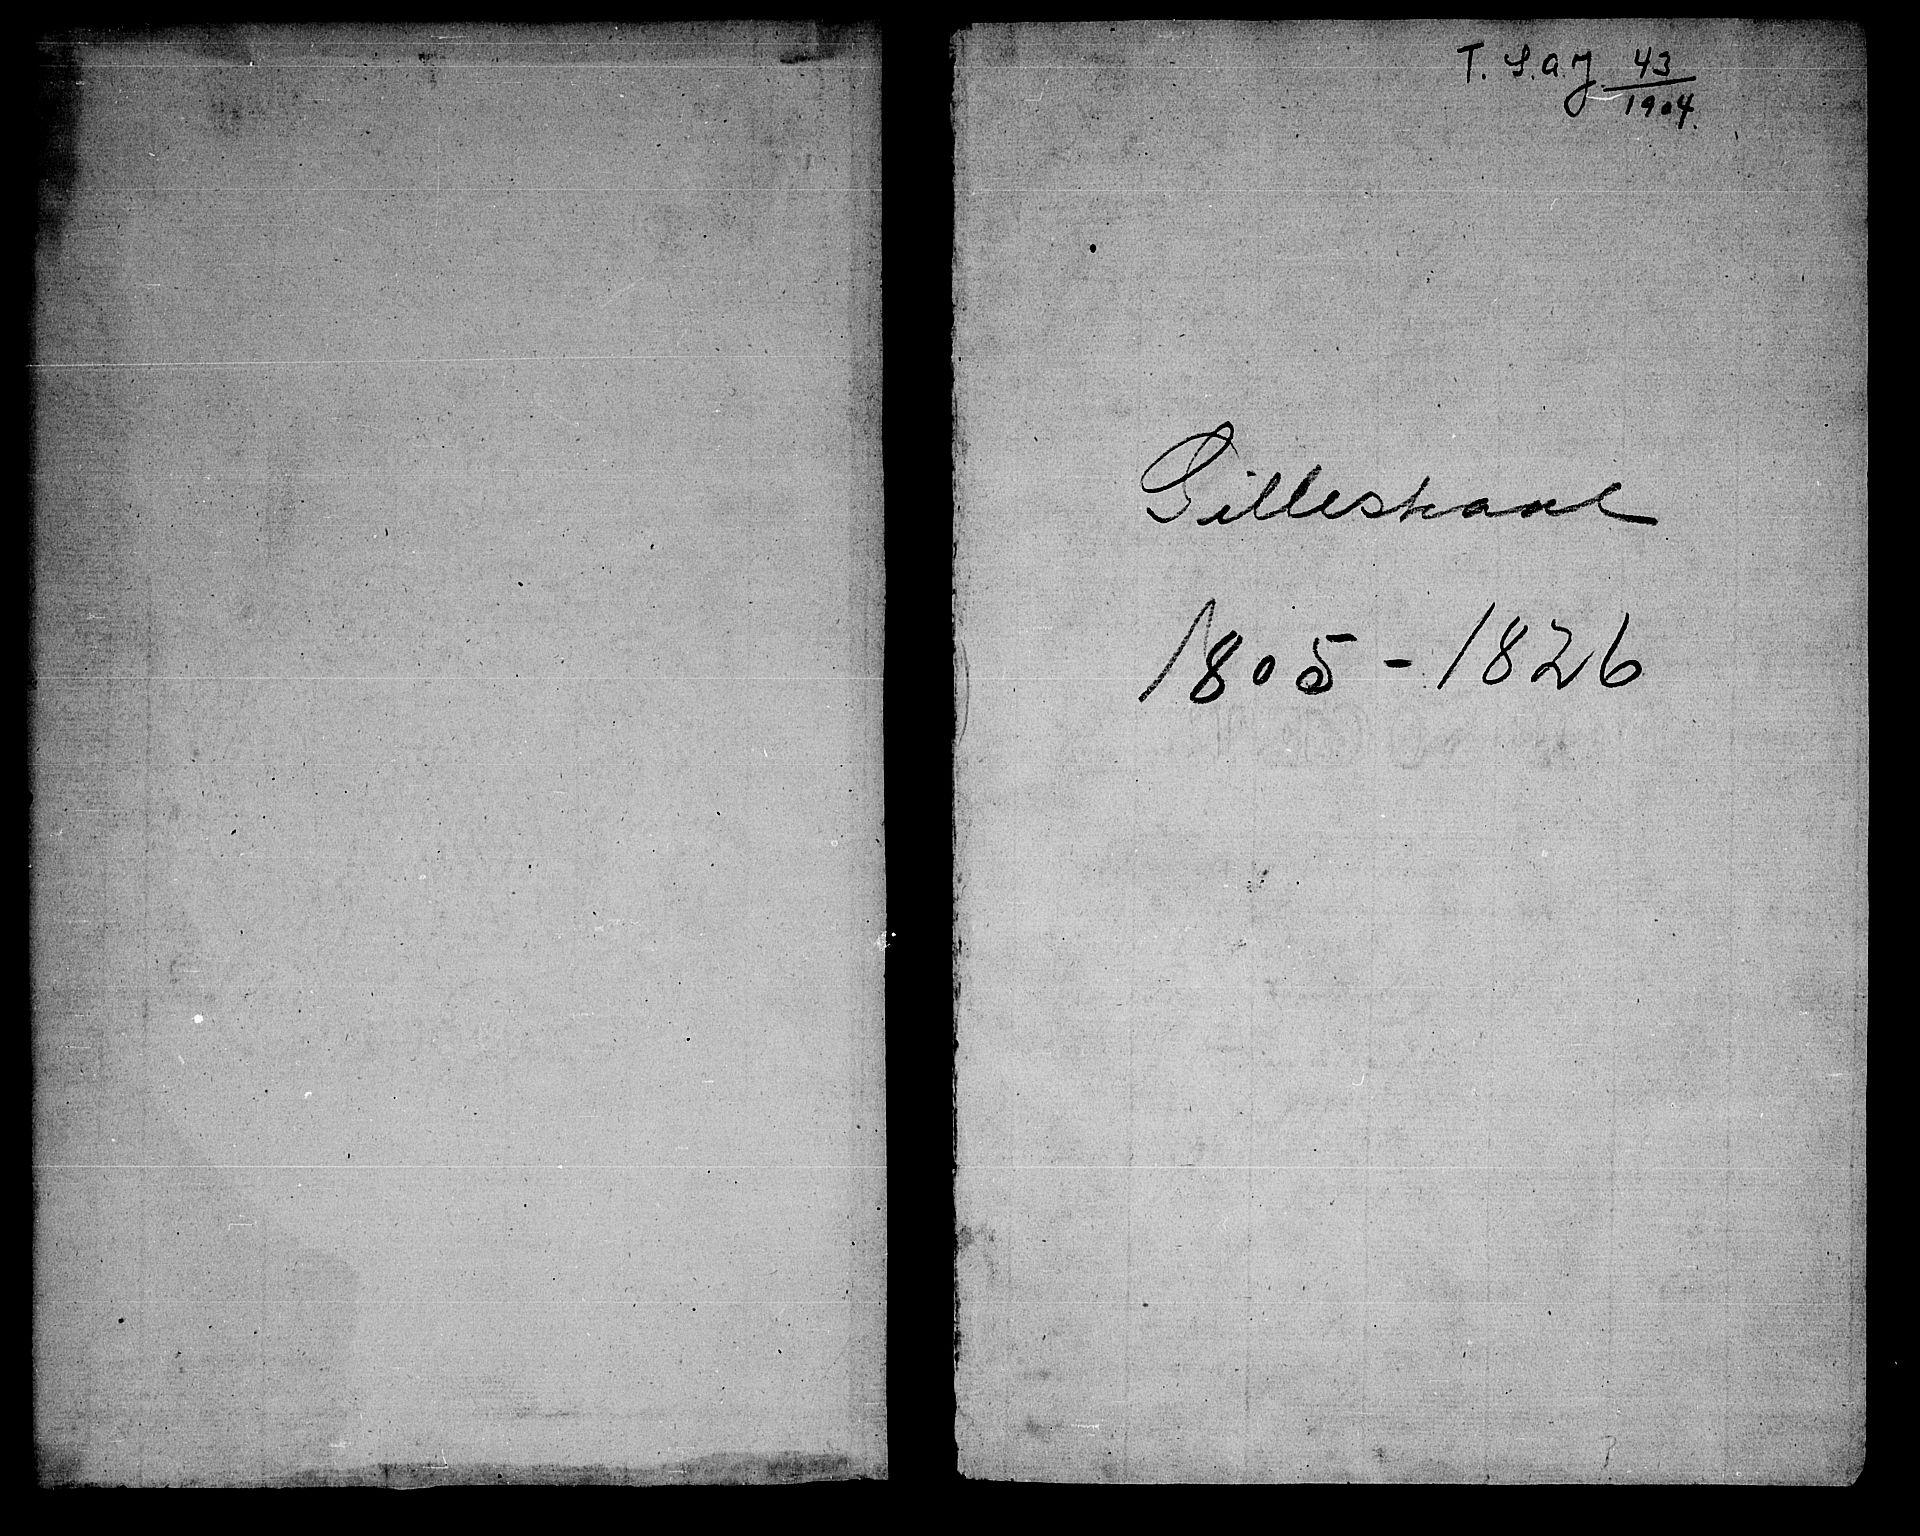 SAT, Ministerialprotokoller, klokkerbøker og fødselsregistre - Nordland, 805/L0095: Ministerialbok nr. 805A02, 1805-1826